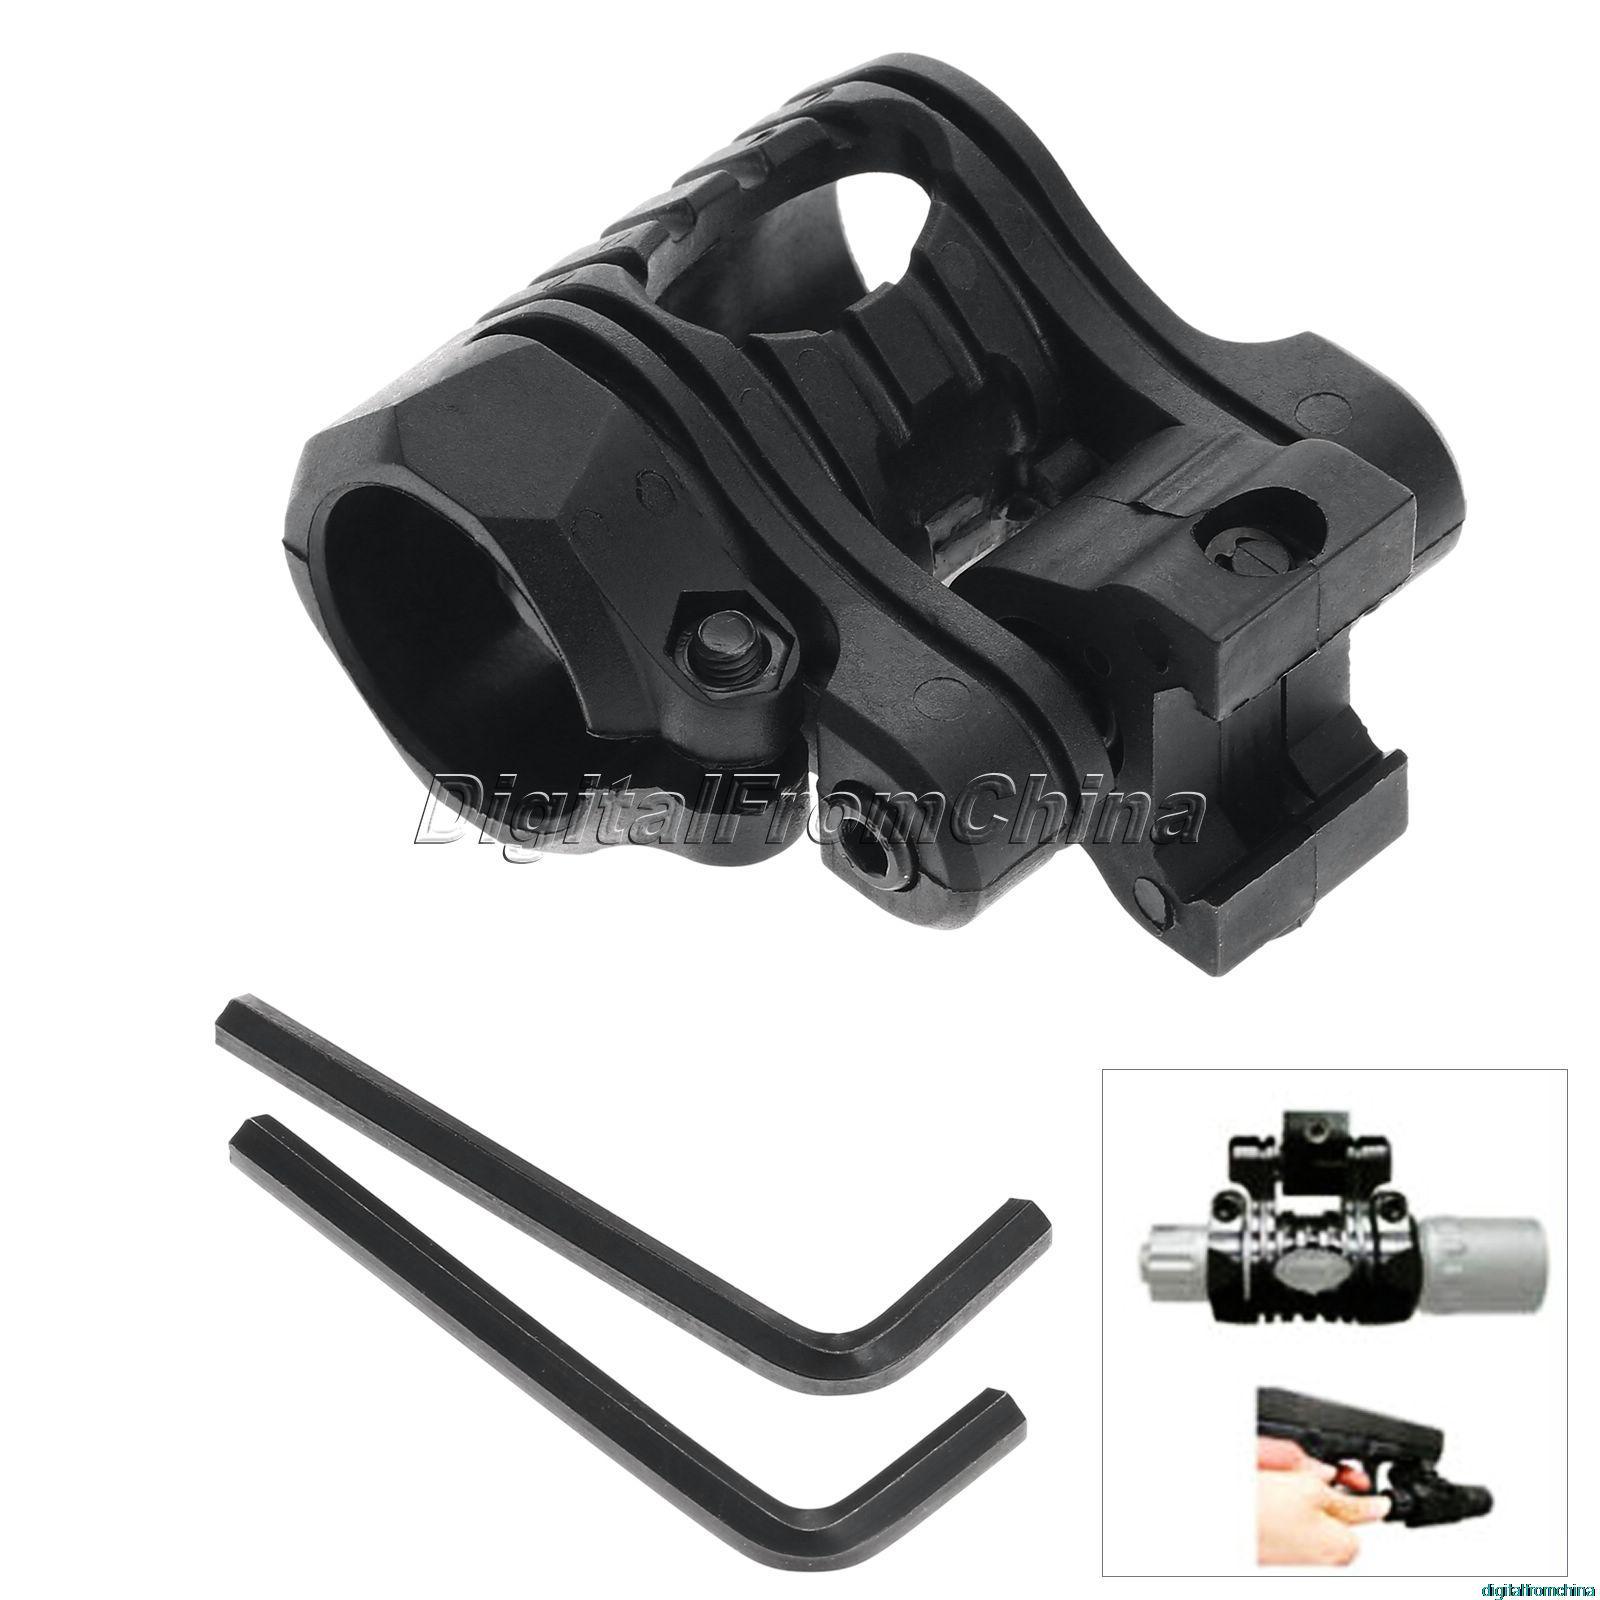 1/'/' 25.4mm Rings Laser Scope Sight Weaver Picatinny fits 20mm Rail Rifle Mount